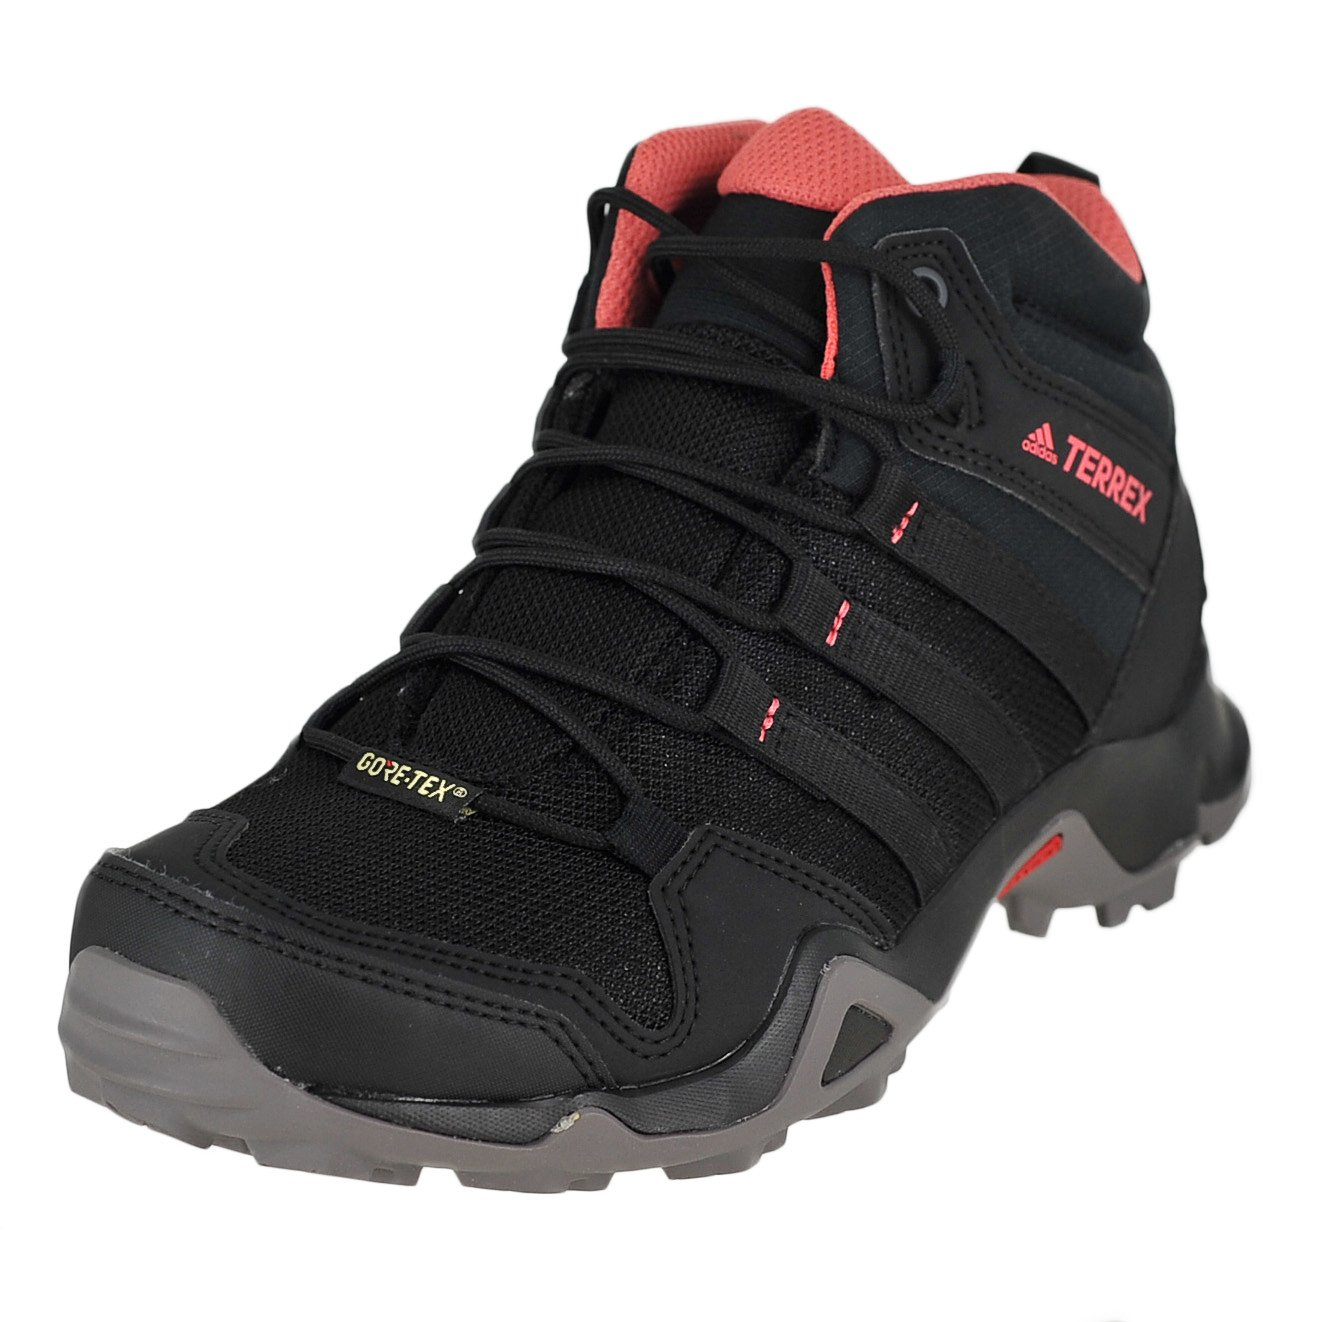 Adidas Sport Performance Women's Terrex AX2R Mid Gore-Tex Outdoor Sneakers, Black Textile, 9.5 M